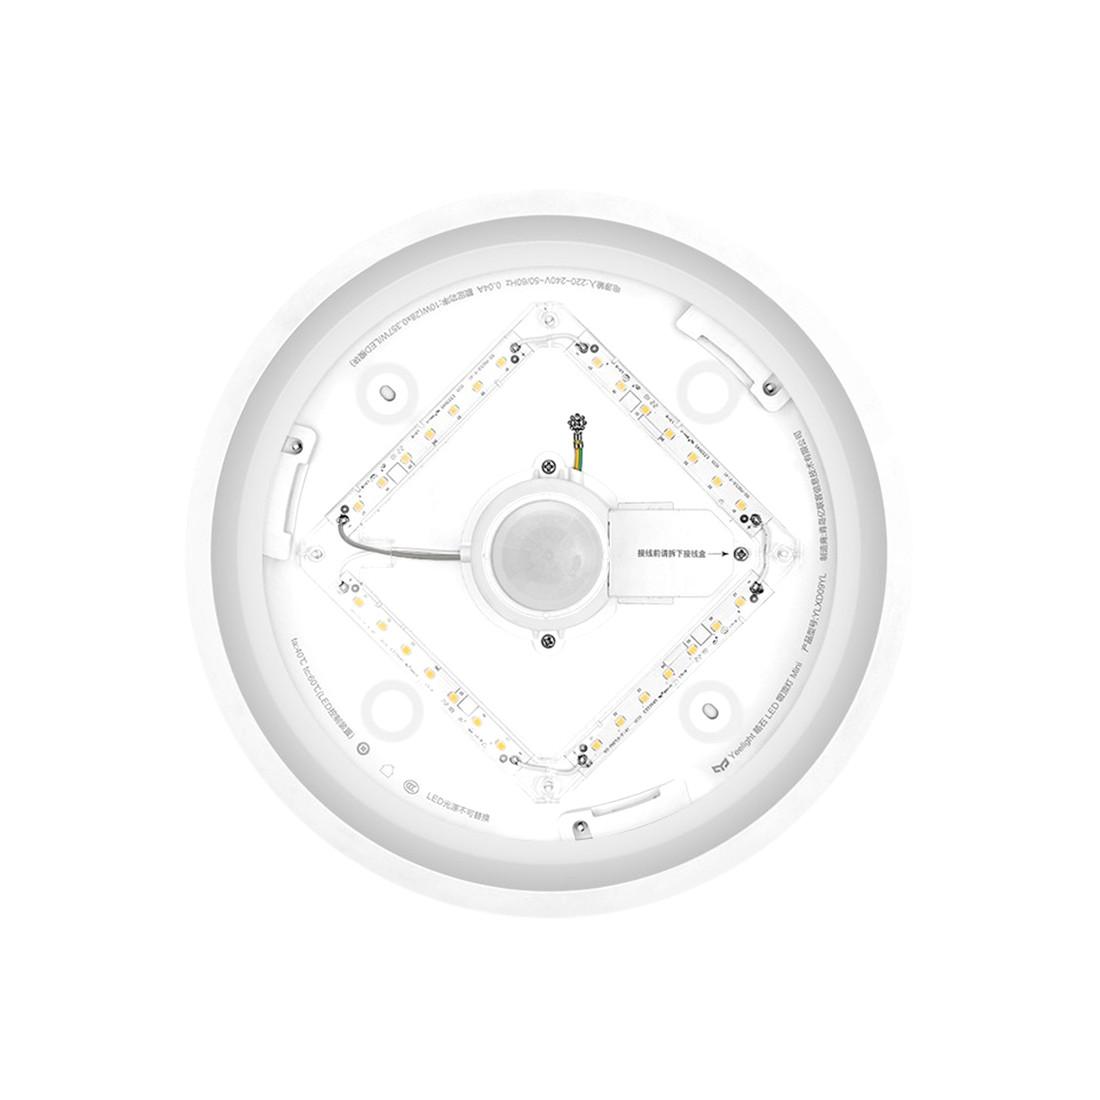 Потолочная лампа Xiaomi Yeelight Crystal Ceiling Light Mini Белый - фото 3